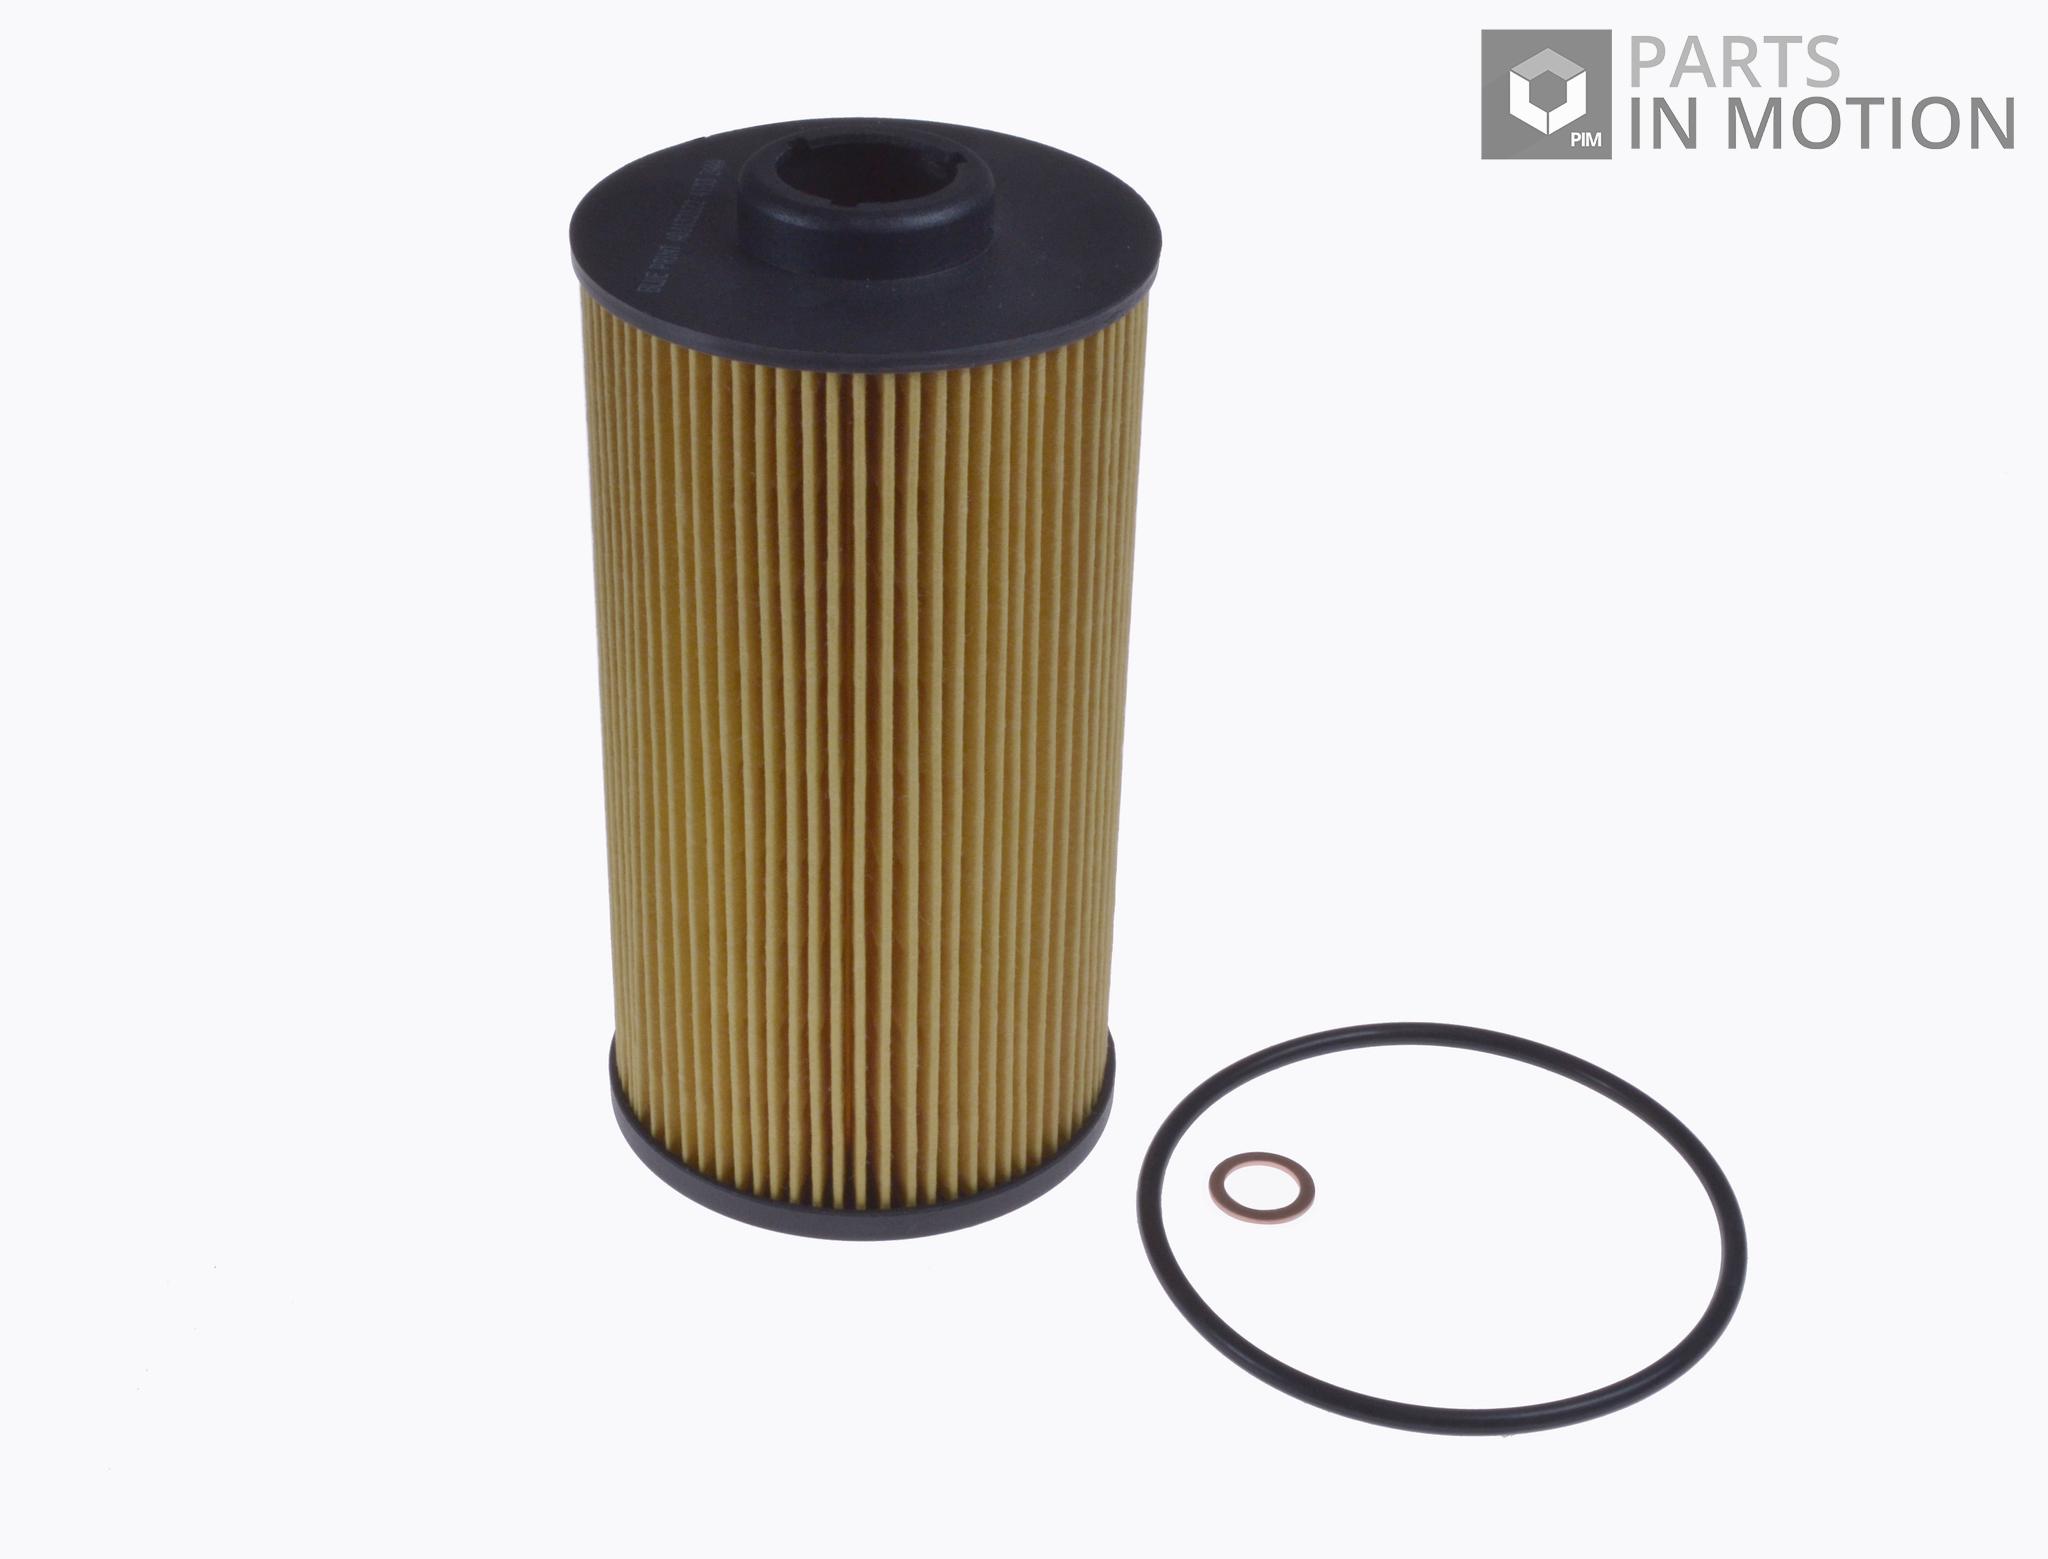 Fits BMW X5 E53 Genuine Bosch Oil Filter Insert